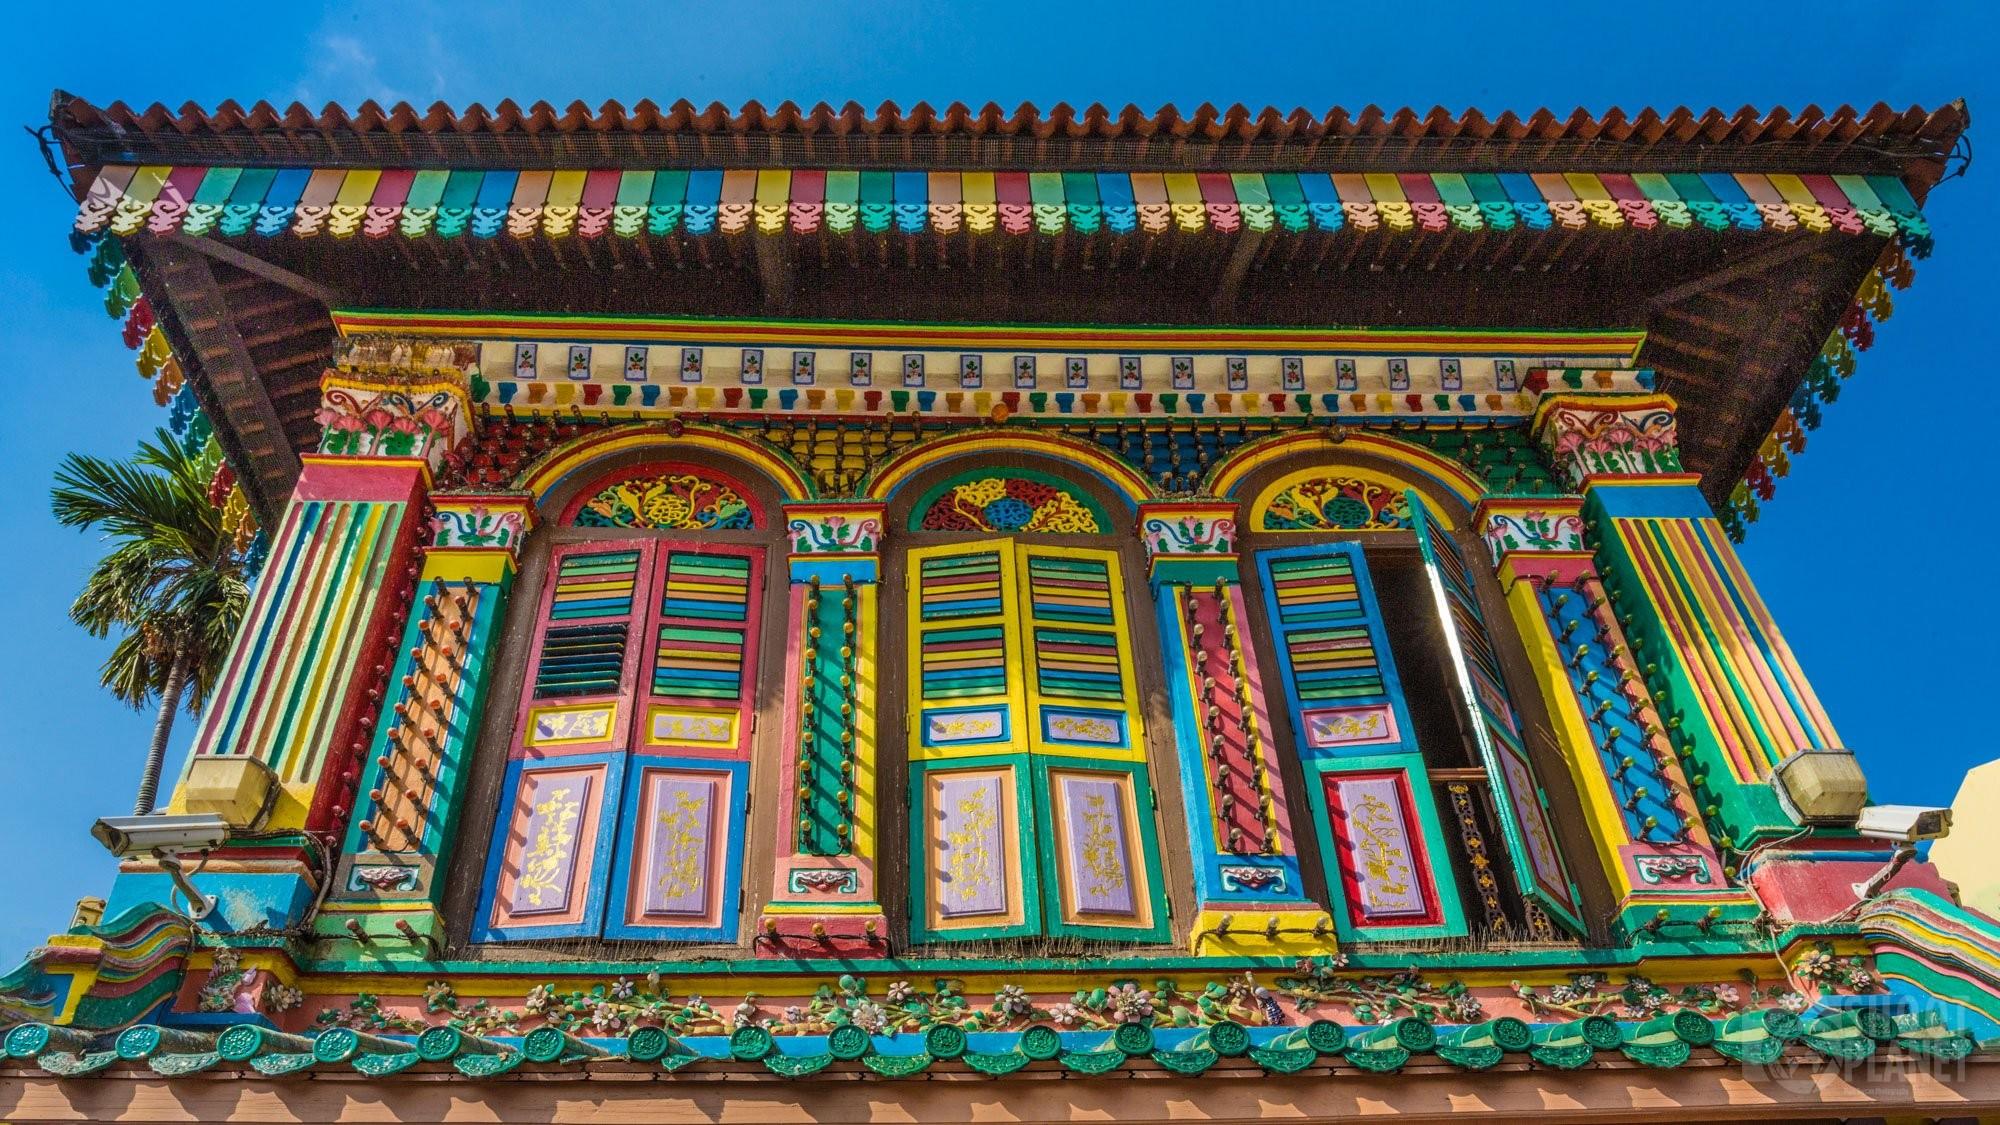 Tan Teng Niah house in little India, Singapore